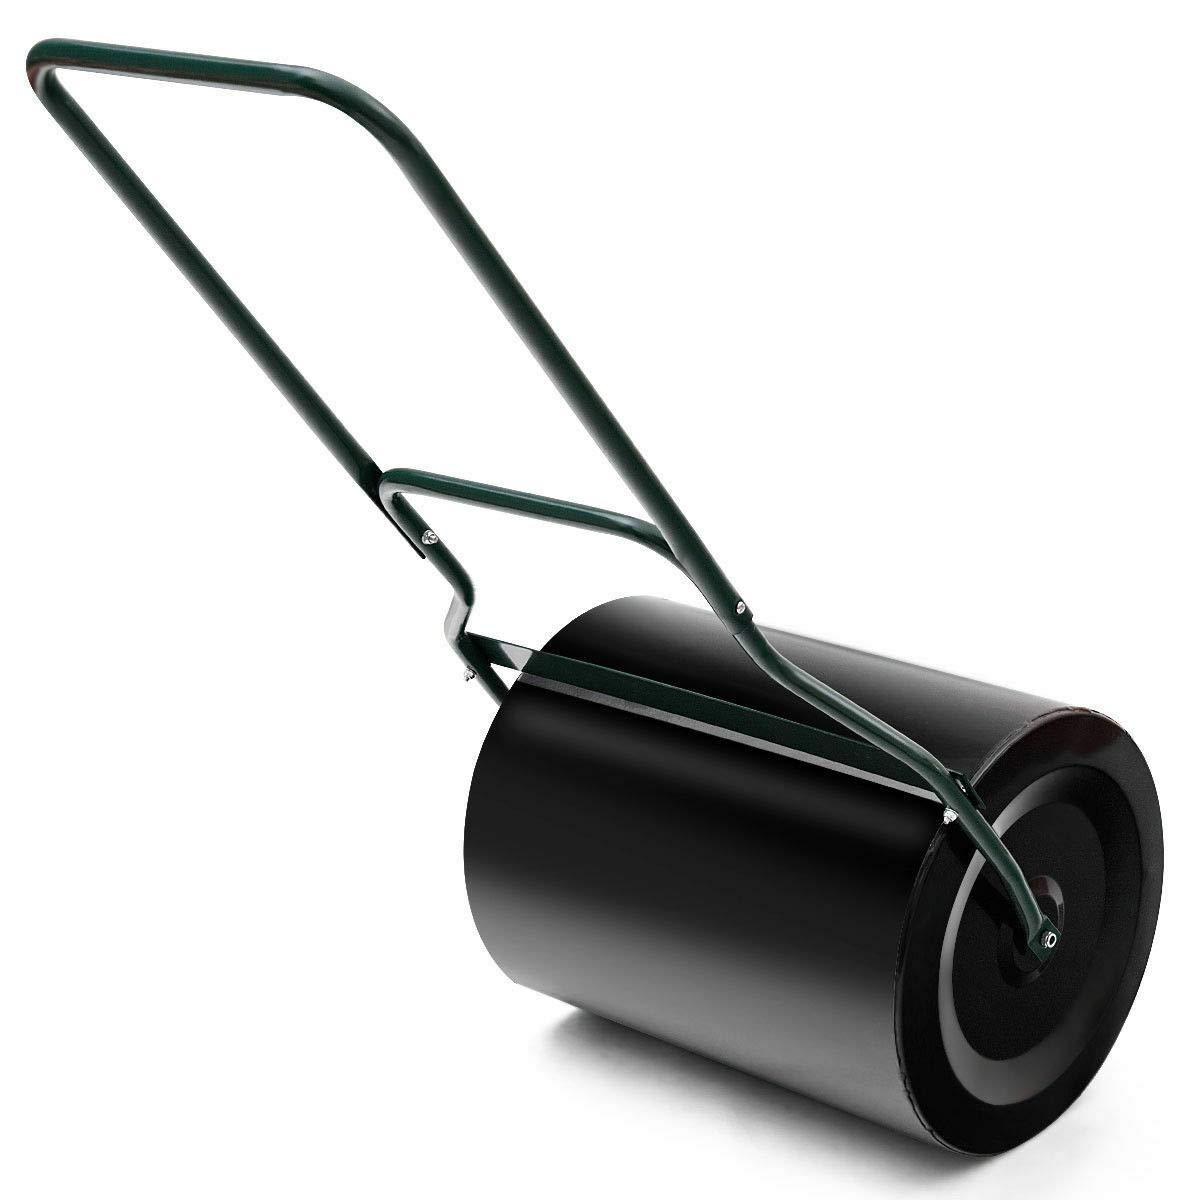 TNPSHOP 16''x 19.5'' Heavy Duty Poly Push Tow Lawn Roller Poly Roller Black